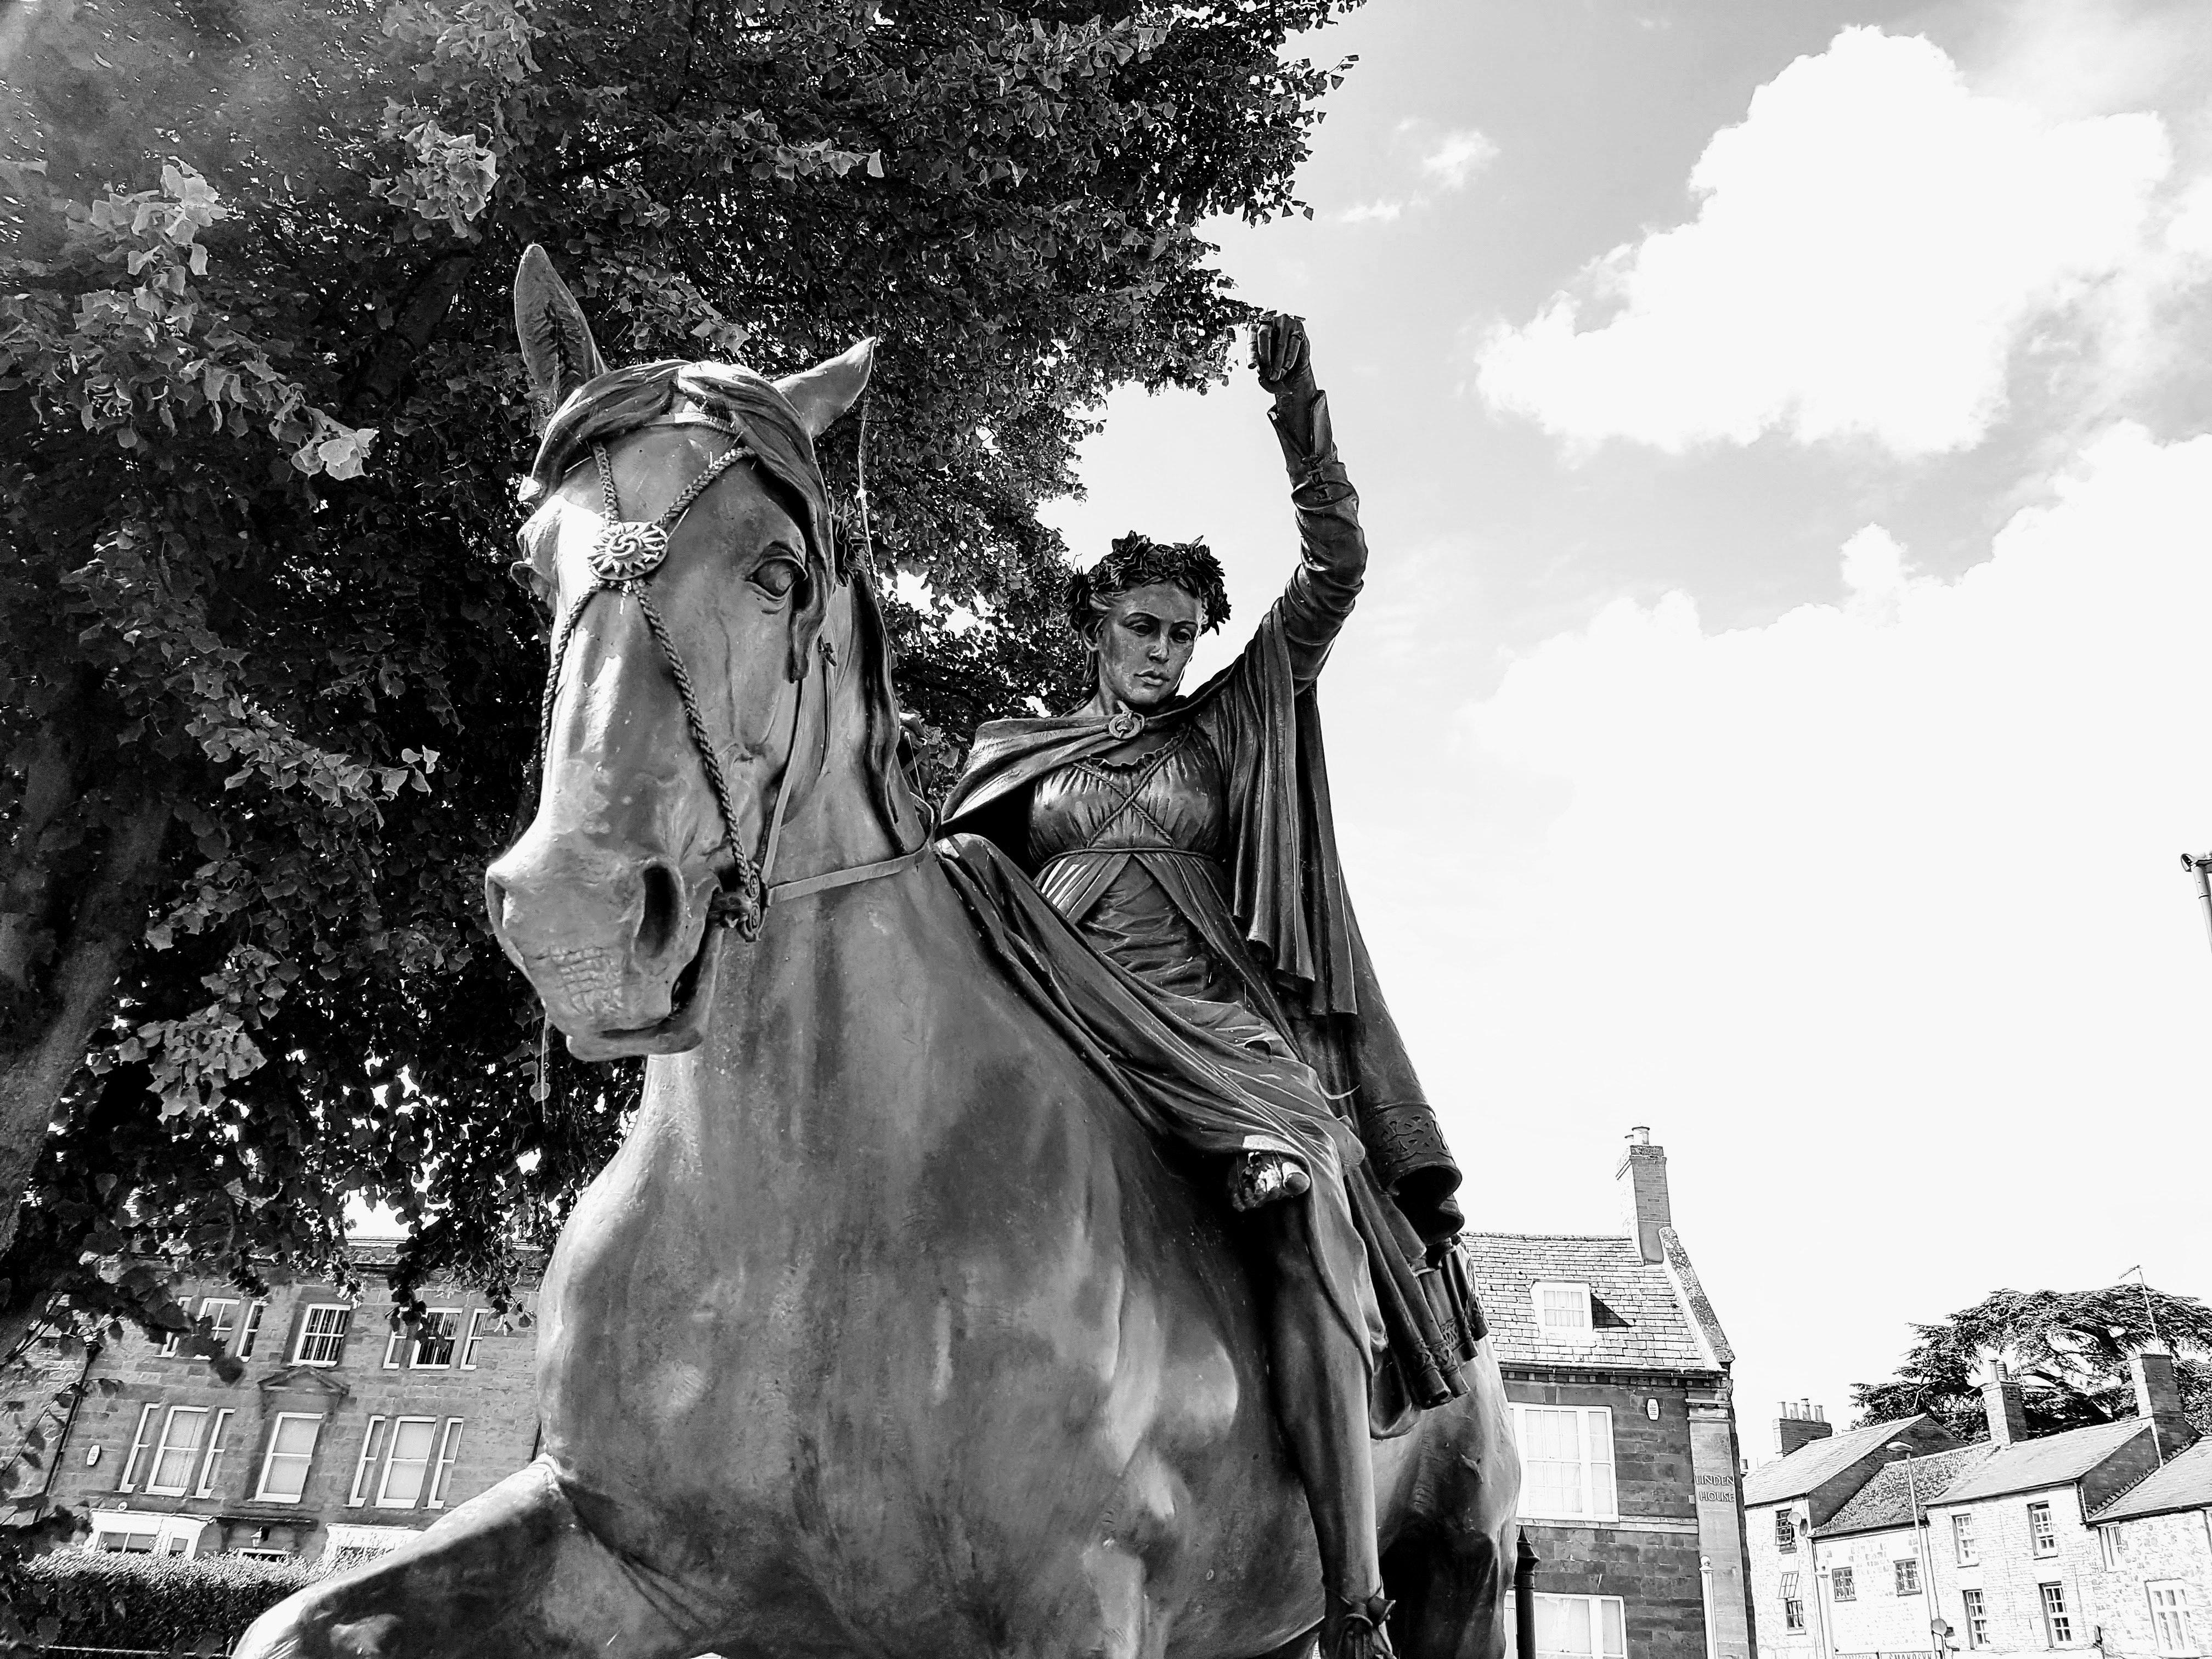 Woman riding horse statue photo